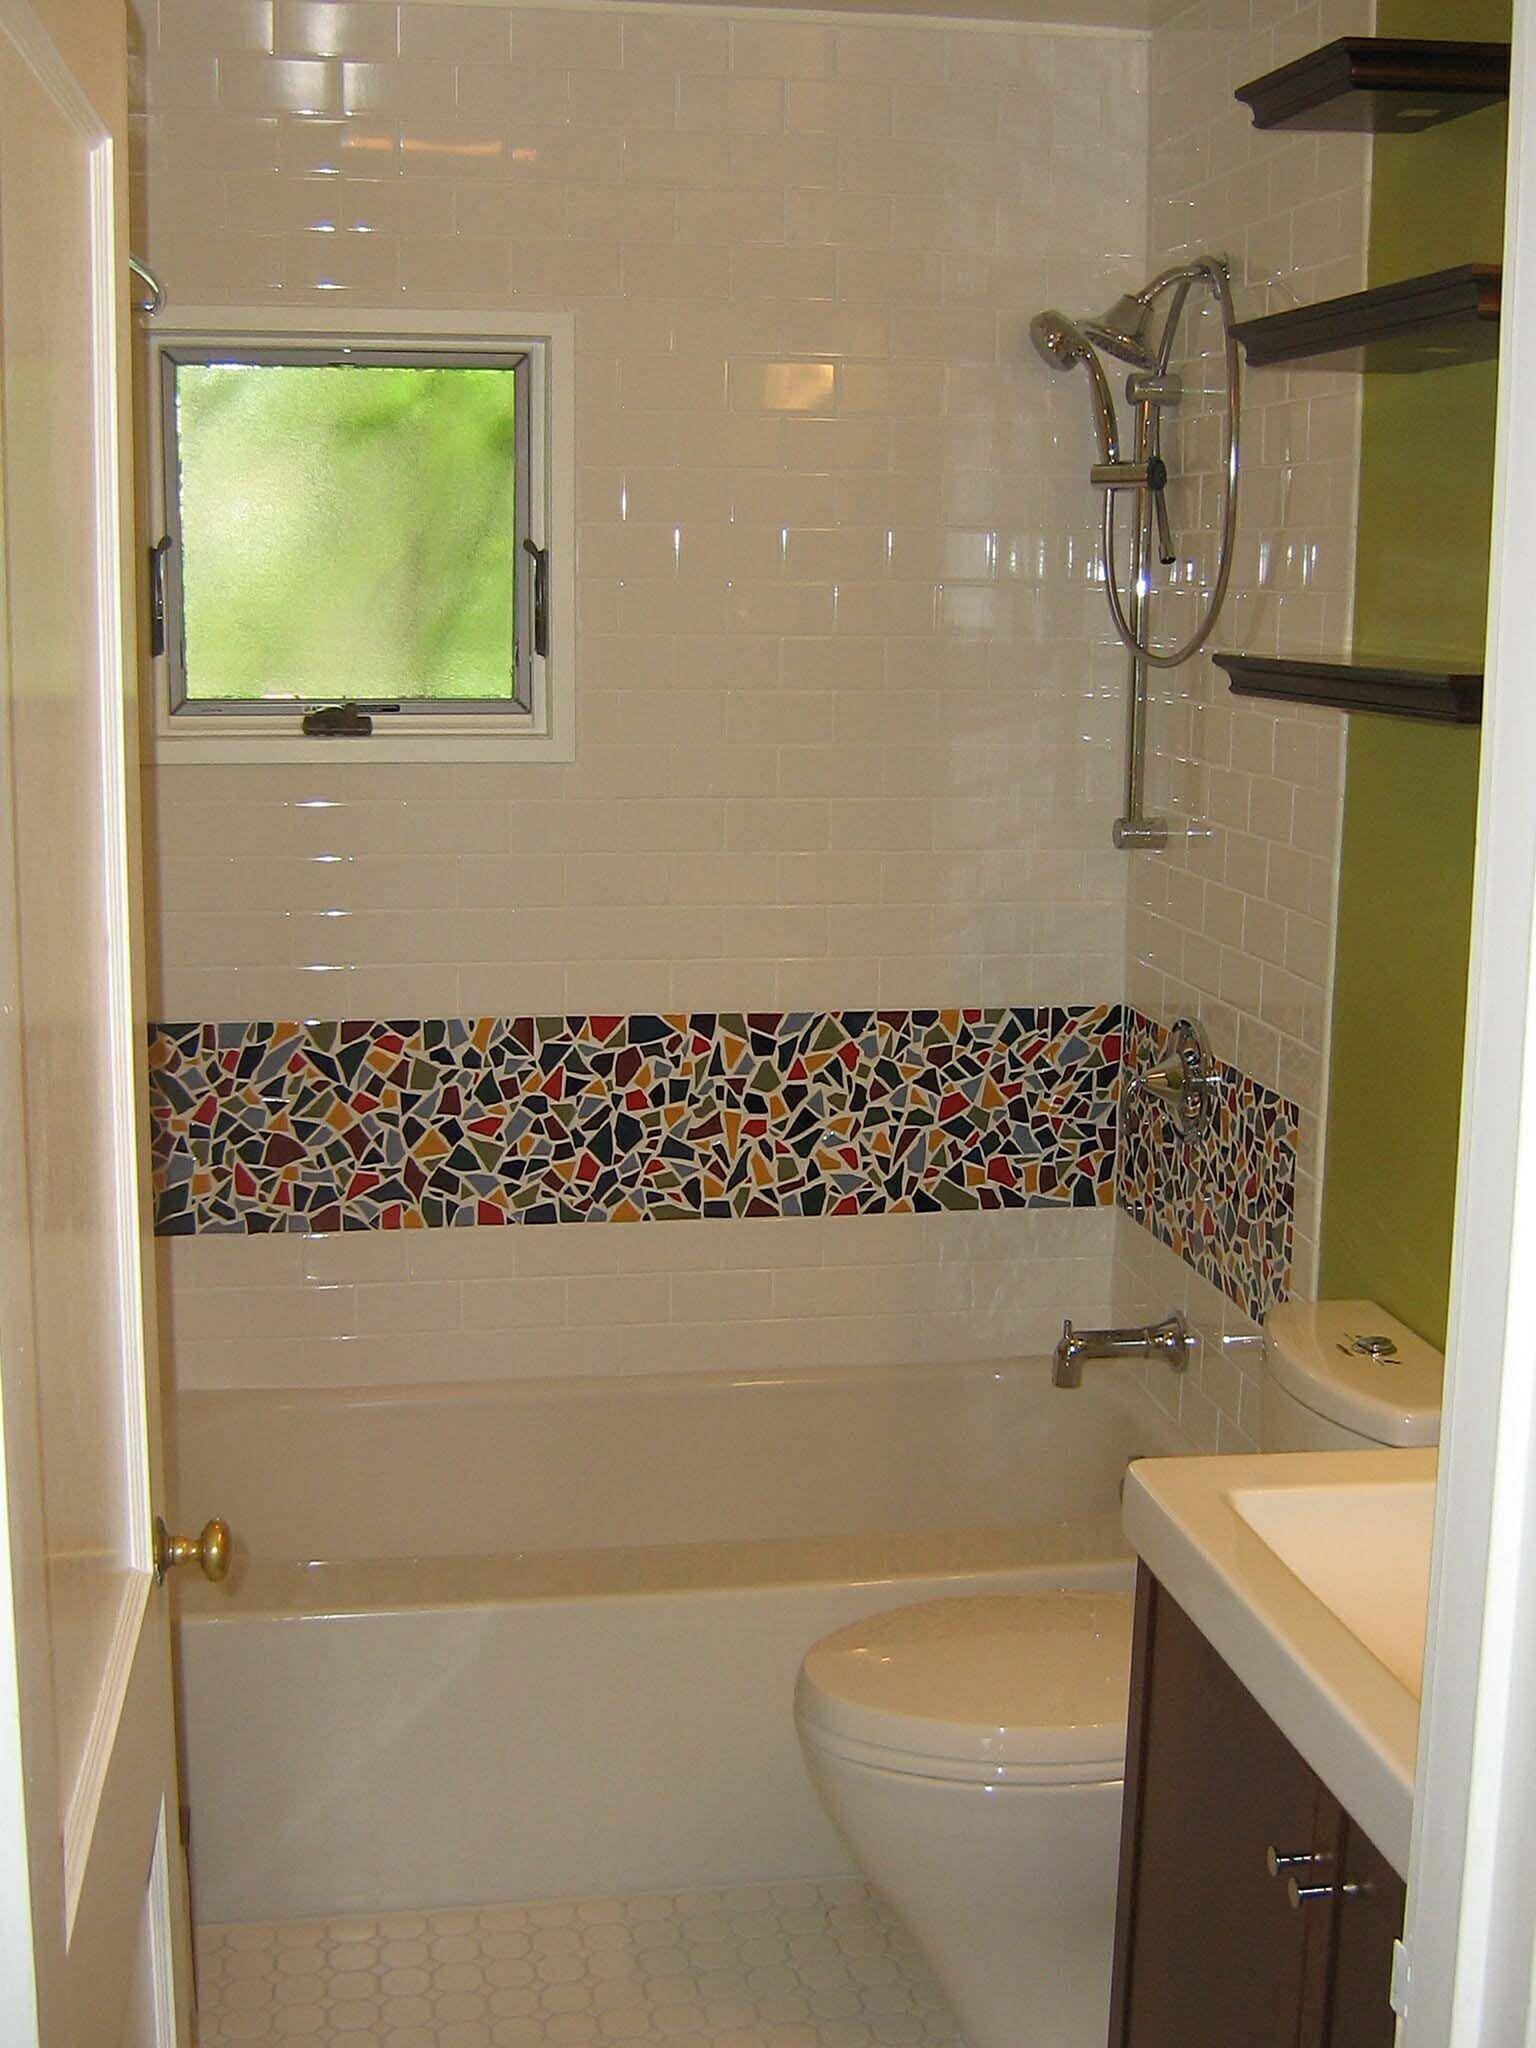 Best 25 Astonishing Bathroom Mosaic Design Ideas Https Decoredo Com 26587 25 Astonishing Bathroom Mosaic Desig Simple Bathroom Fancy Bathroom Mosaic Bathroom